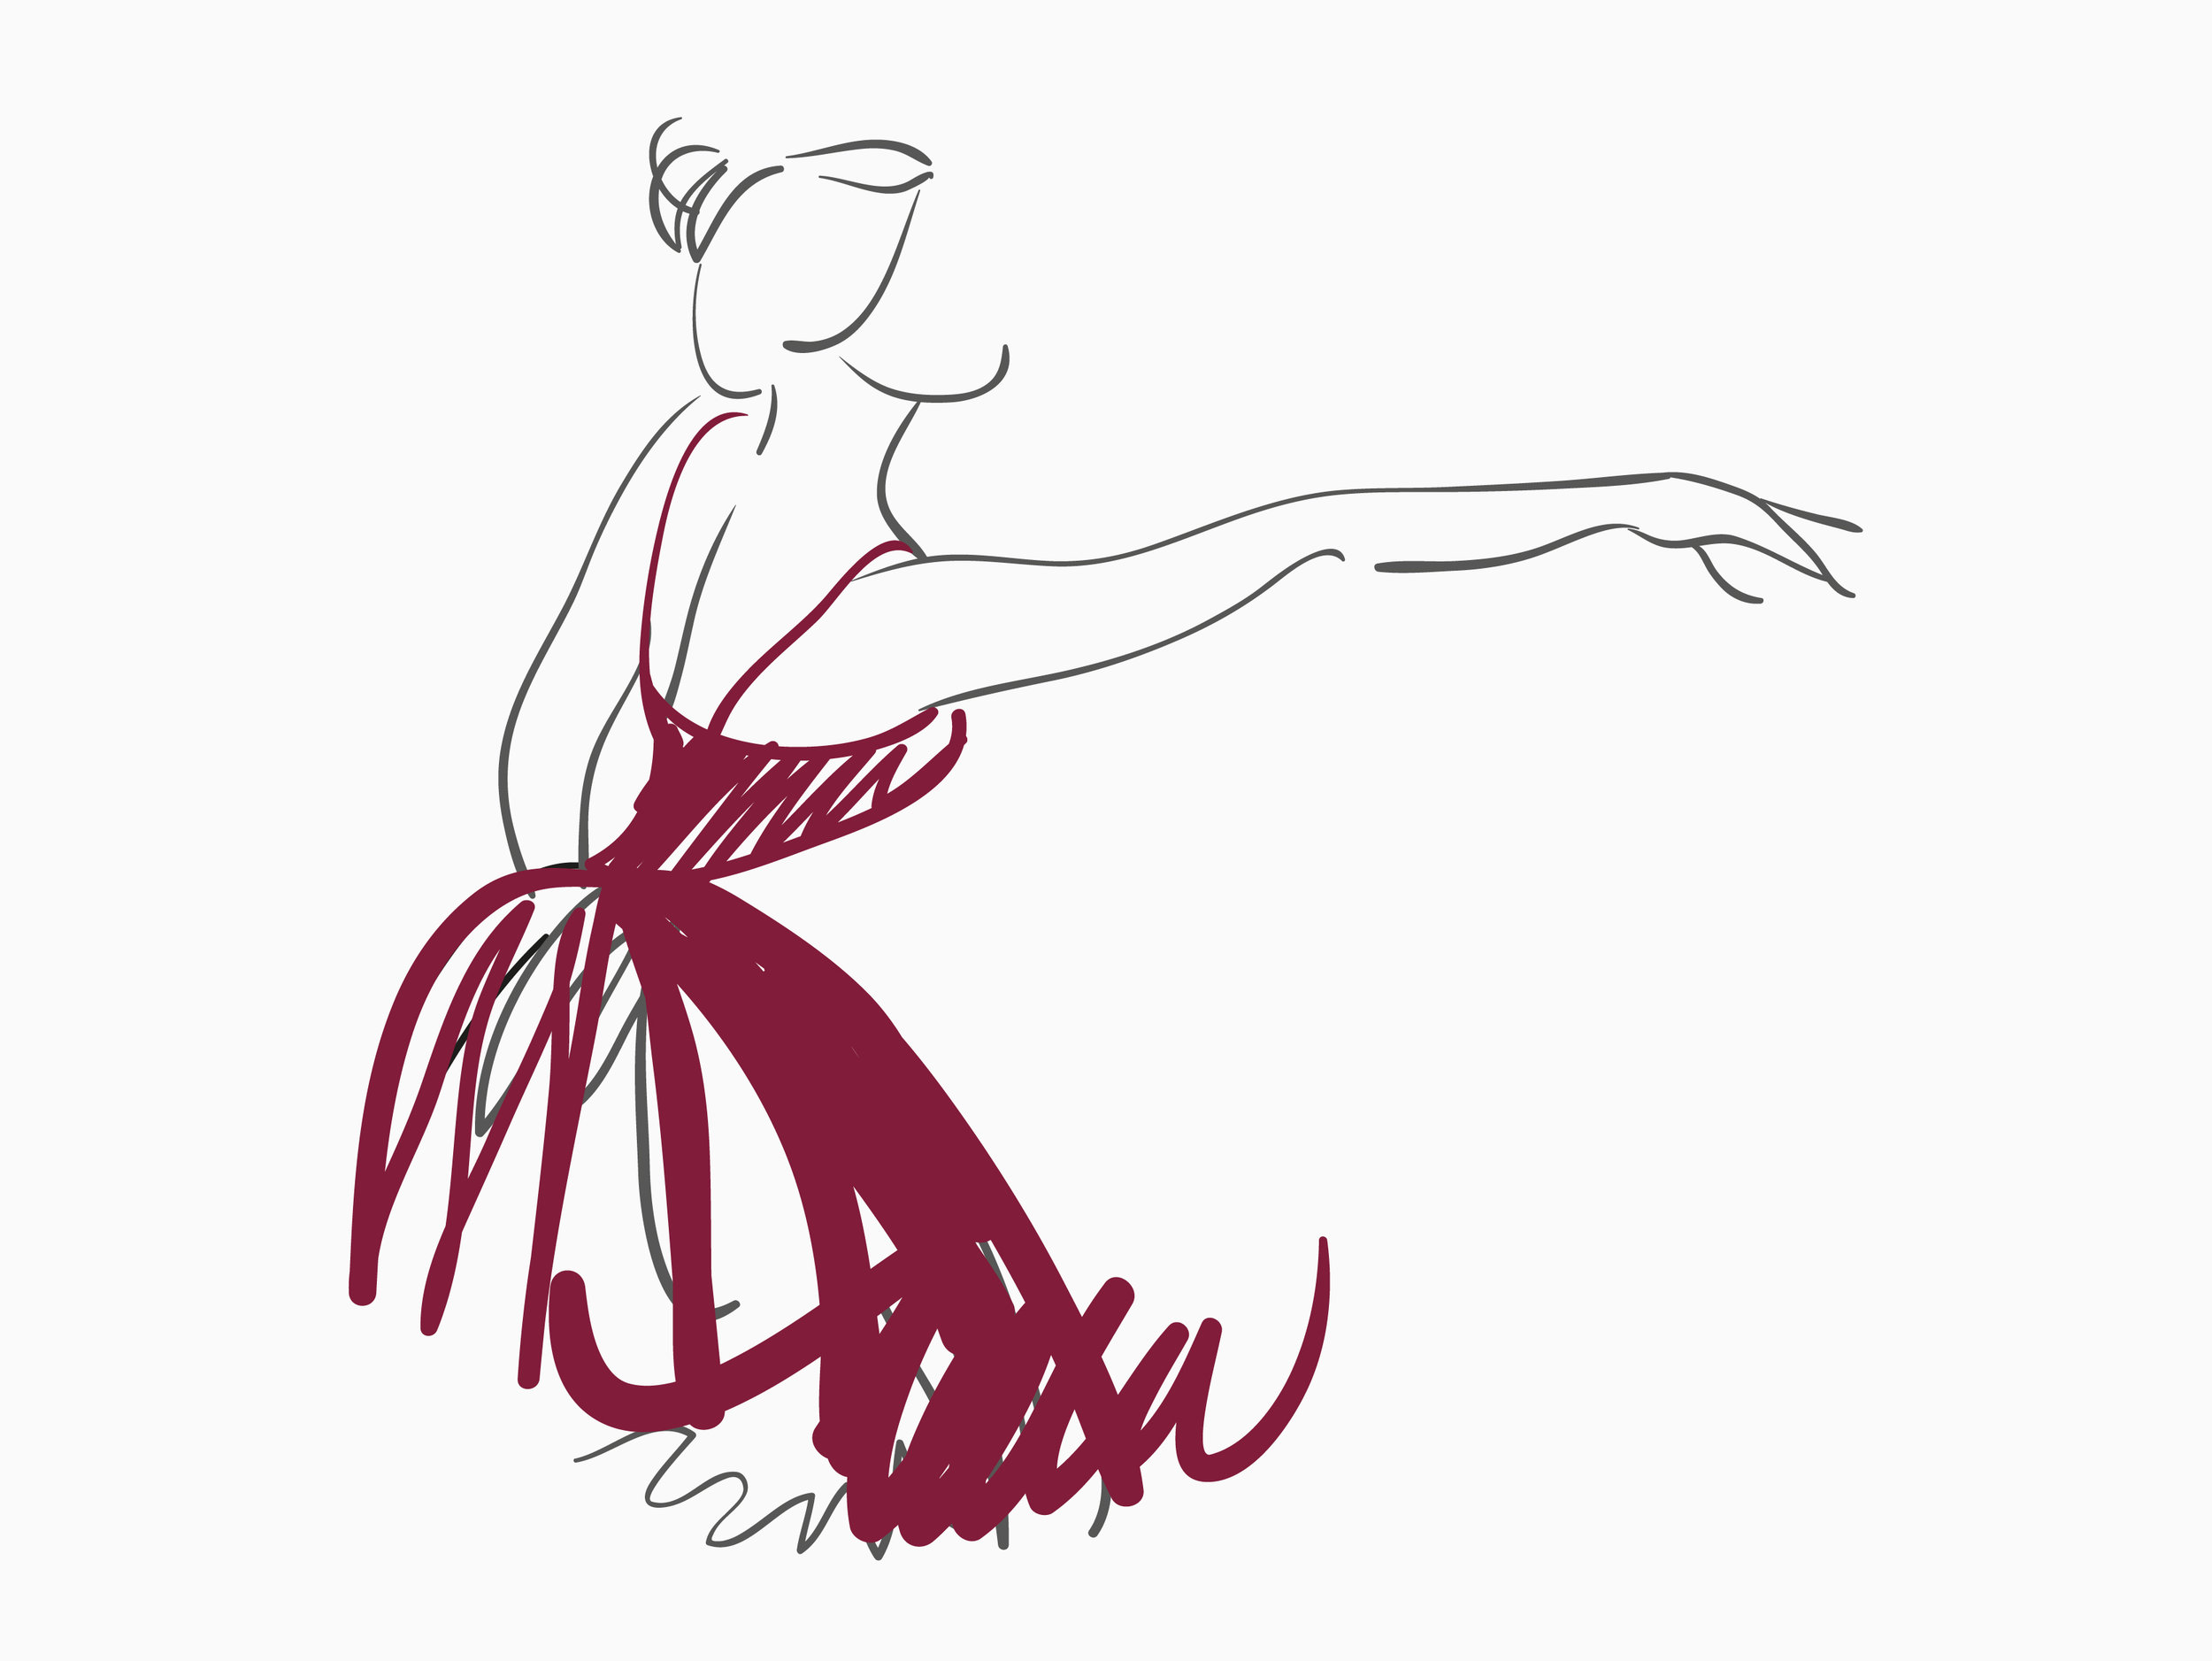 balletGirl-01-01.jpg